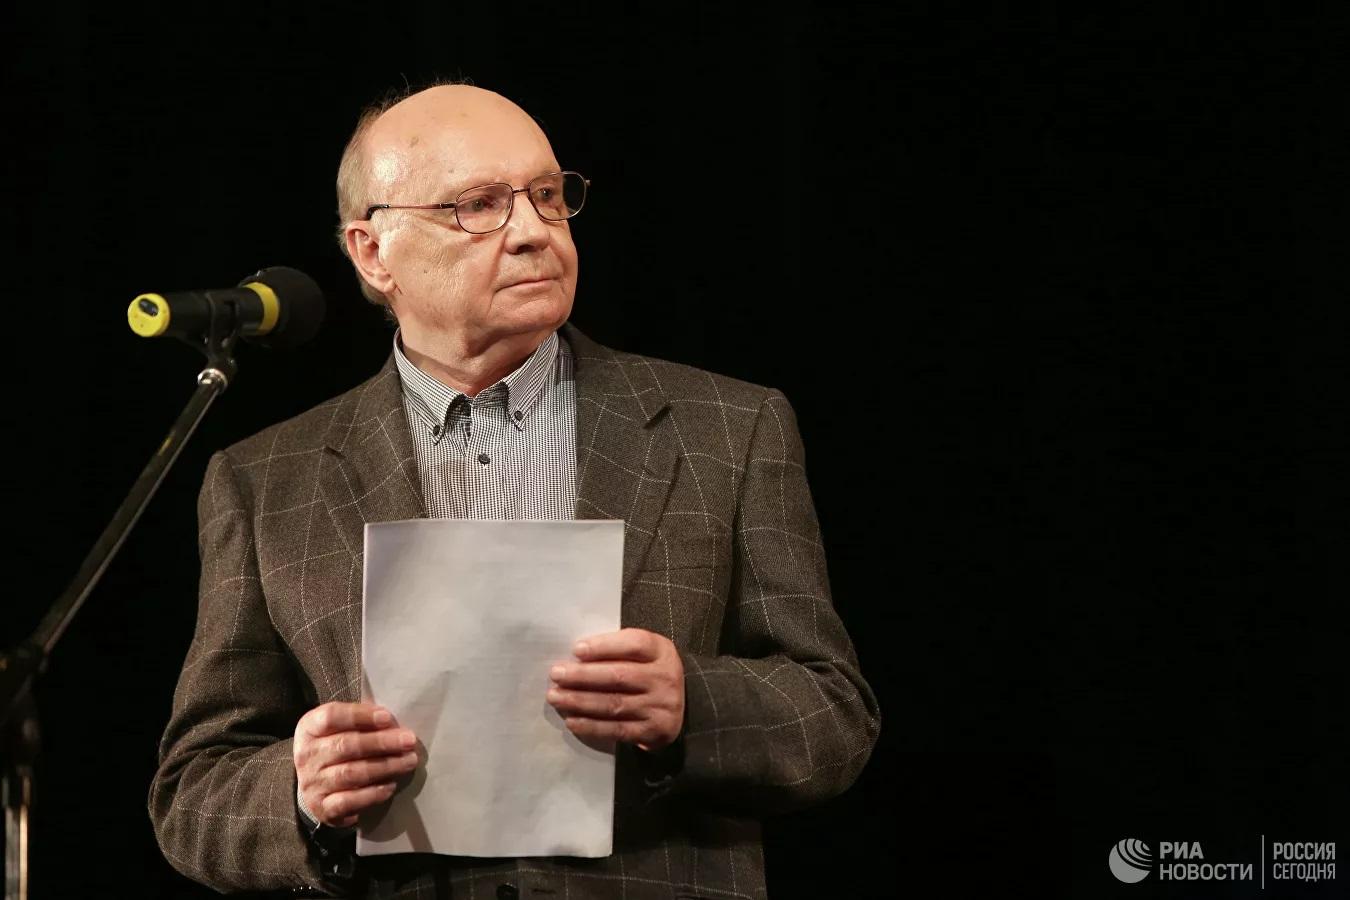 На 83-м году жизни скончался актёр Андрей Мягков